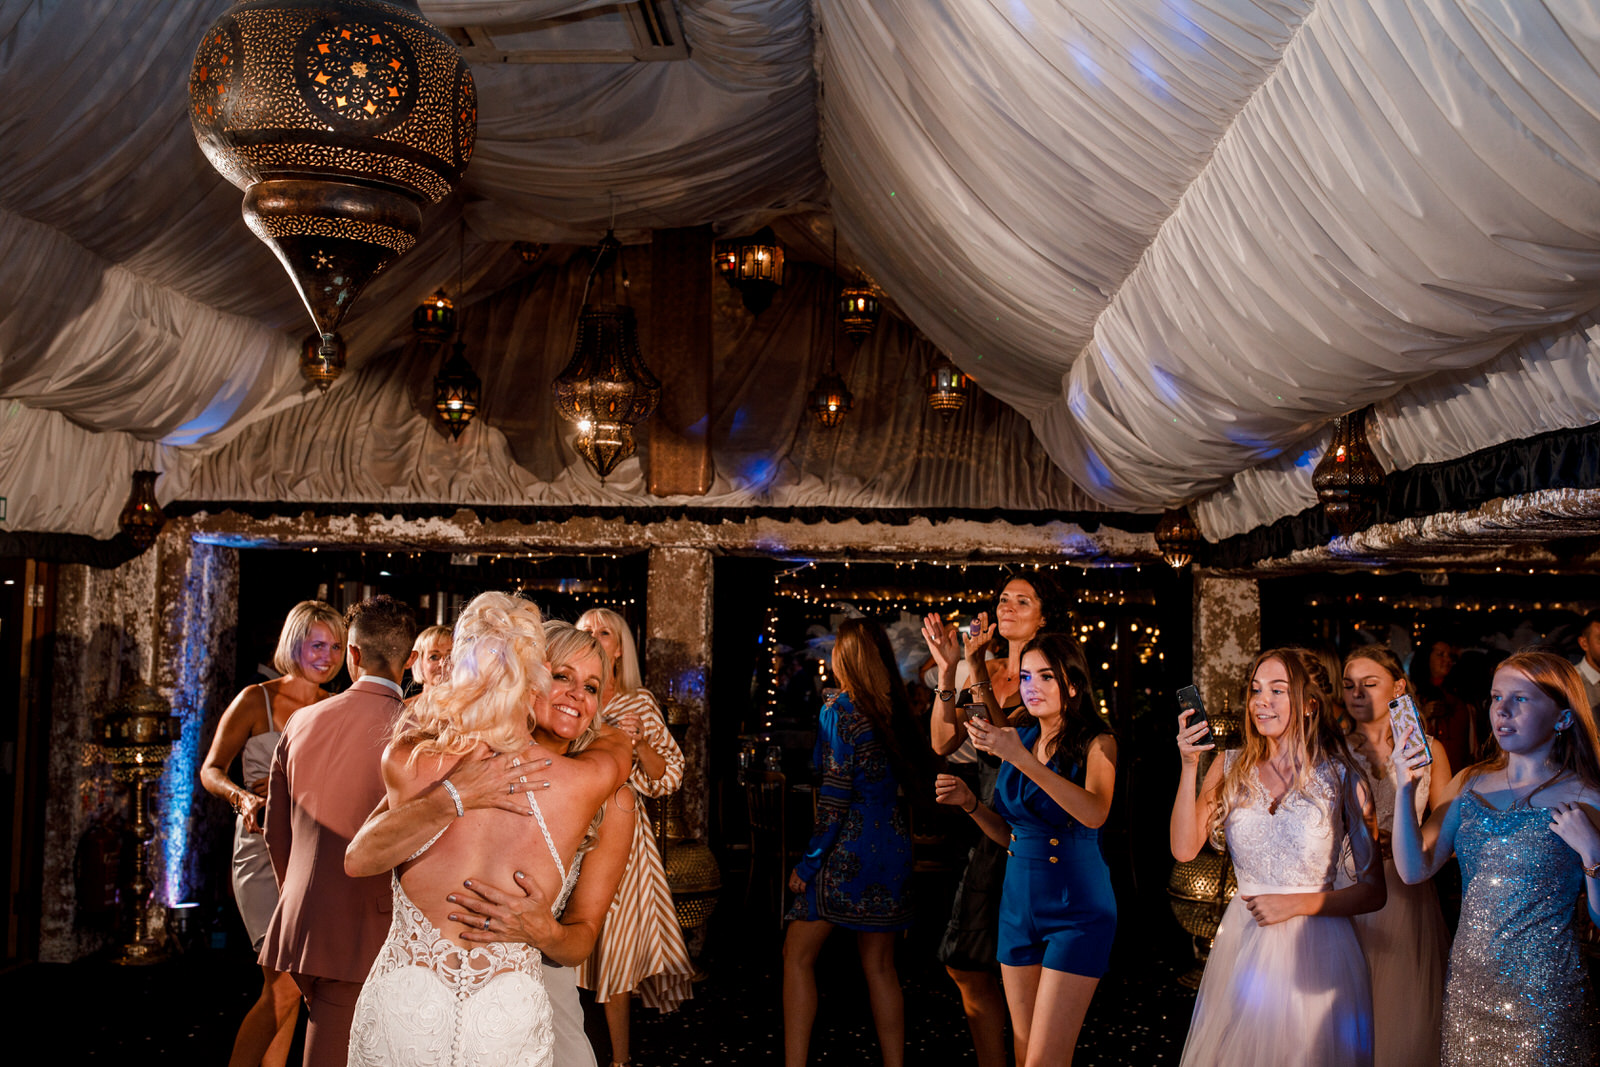 wedding dancing at the crazy bear